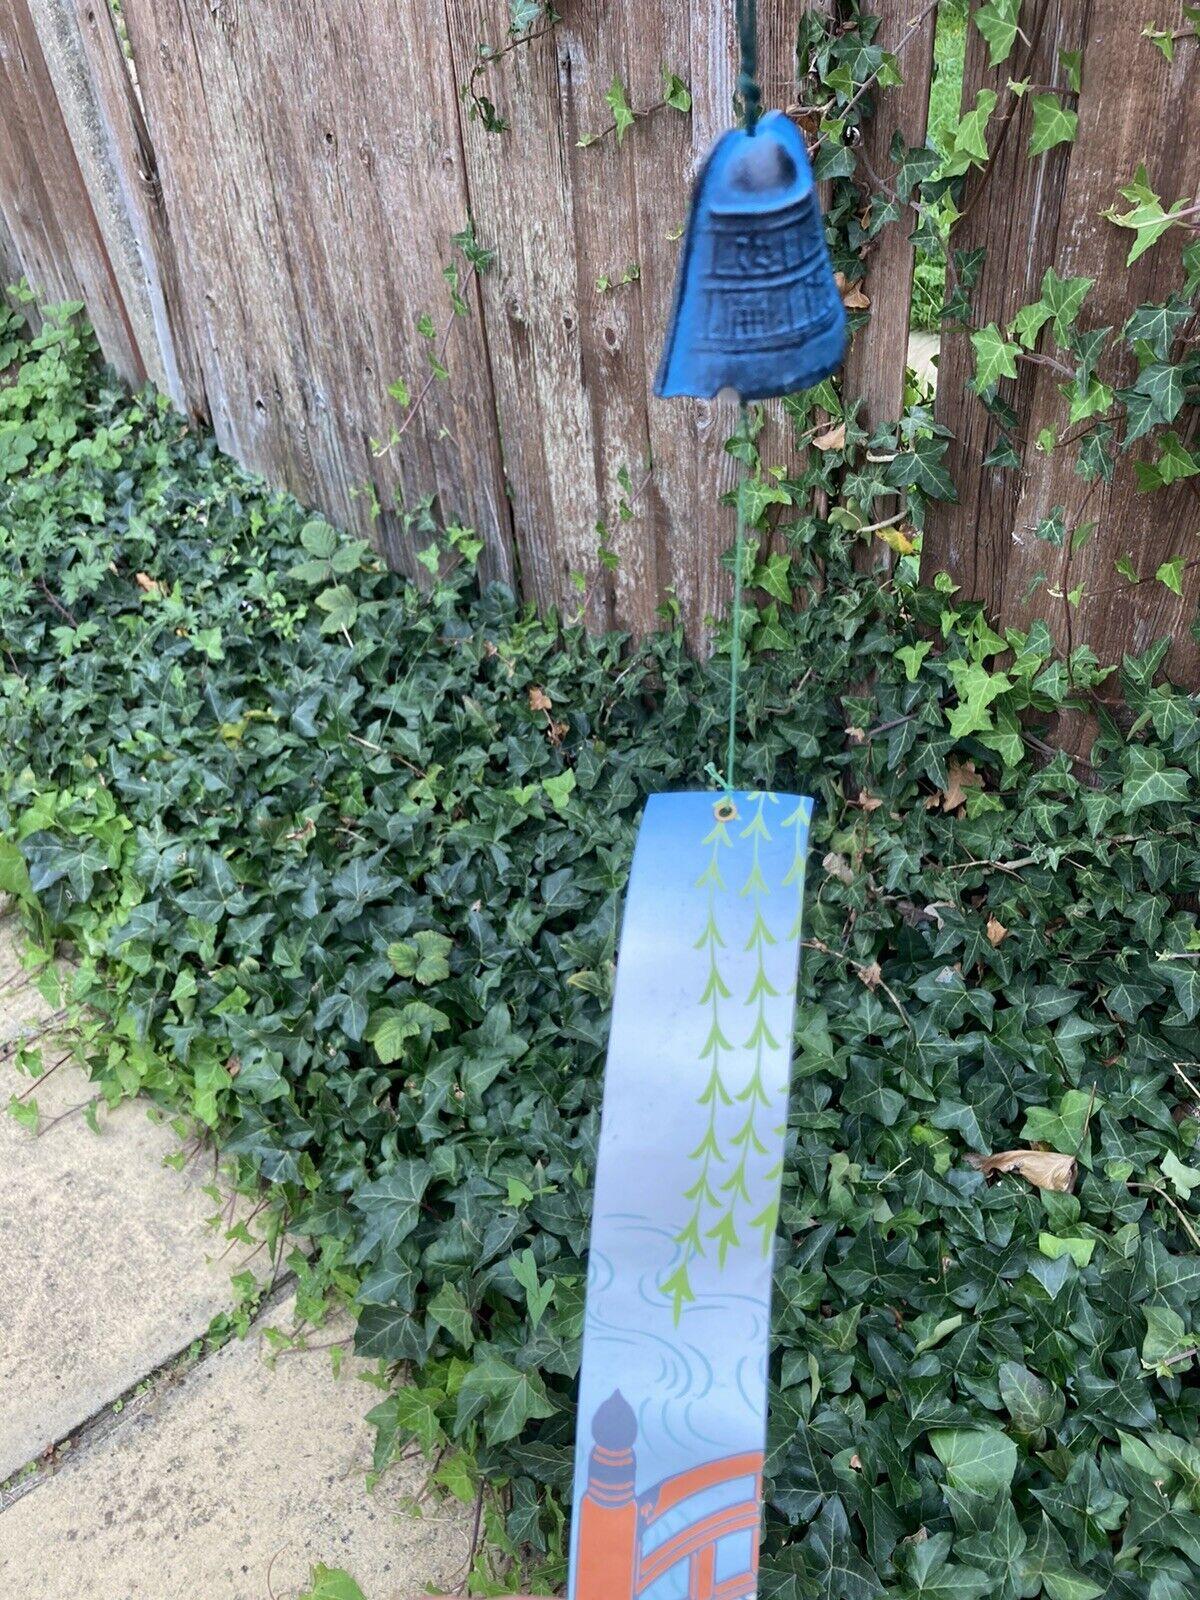 BNIB Vintage Tradition Japanese Wind Chime Nambu Cast Iron bell Iwachu Feng Shui